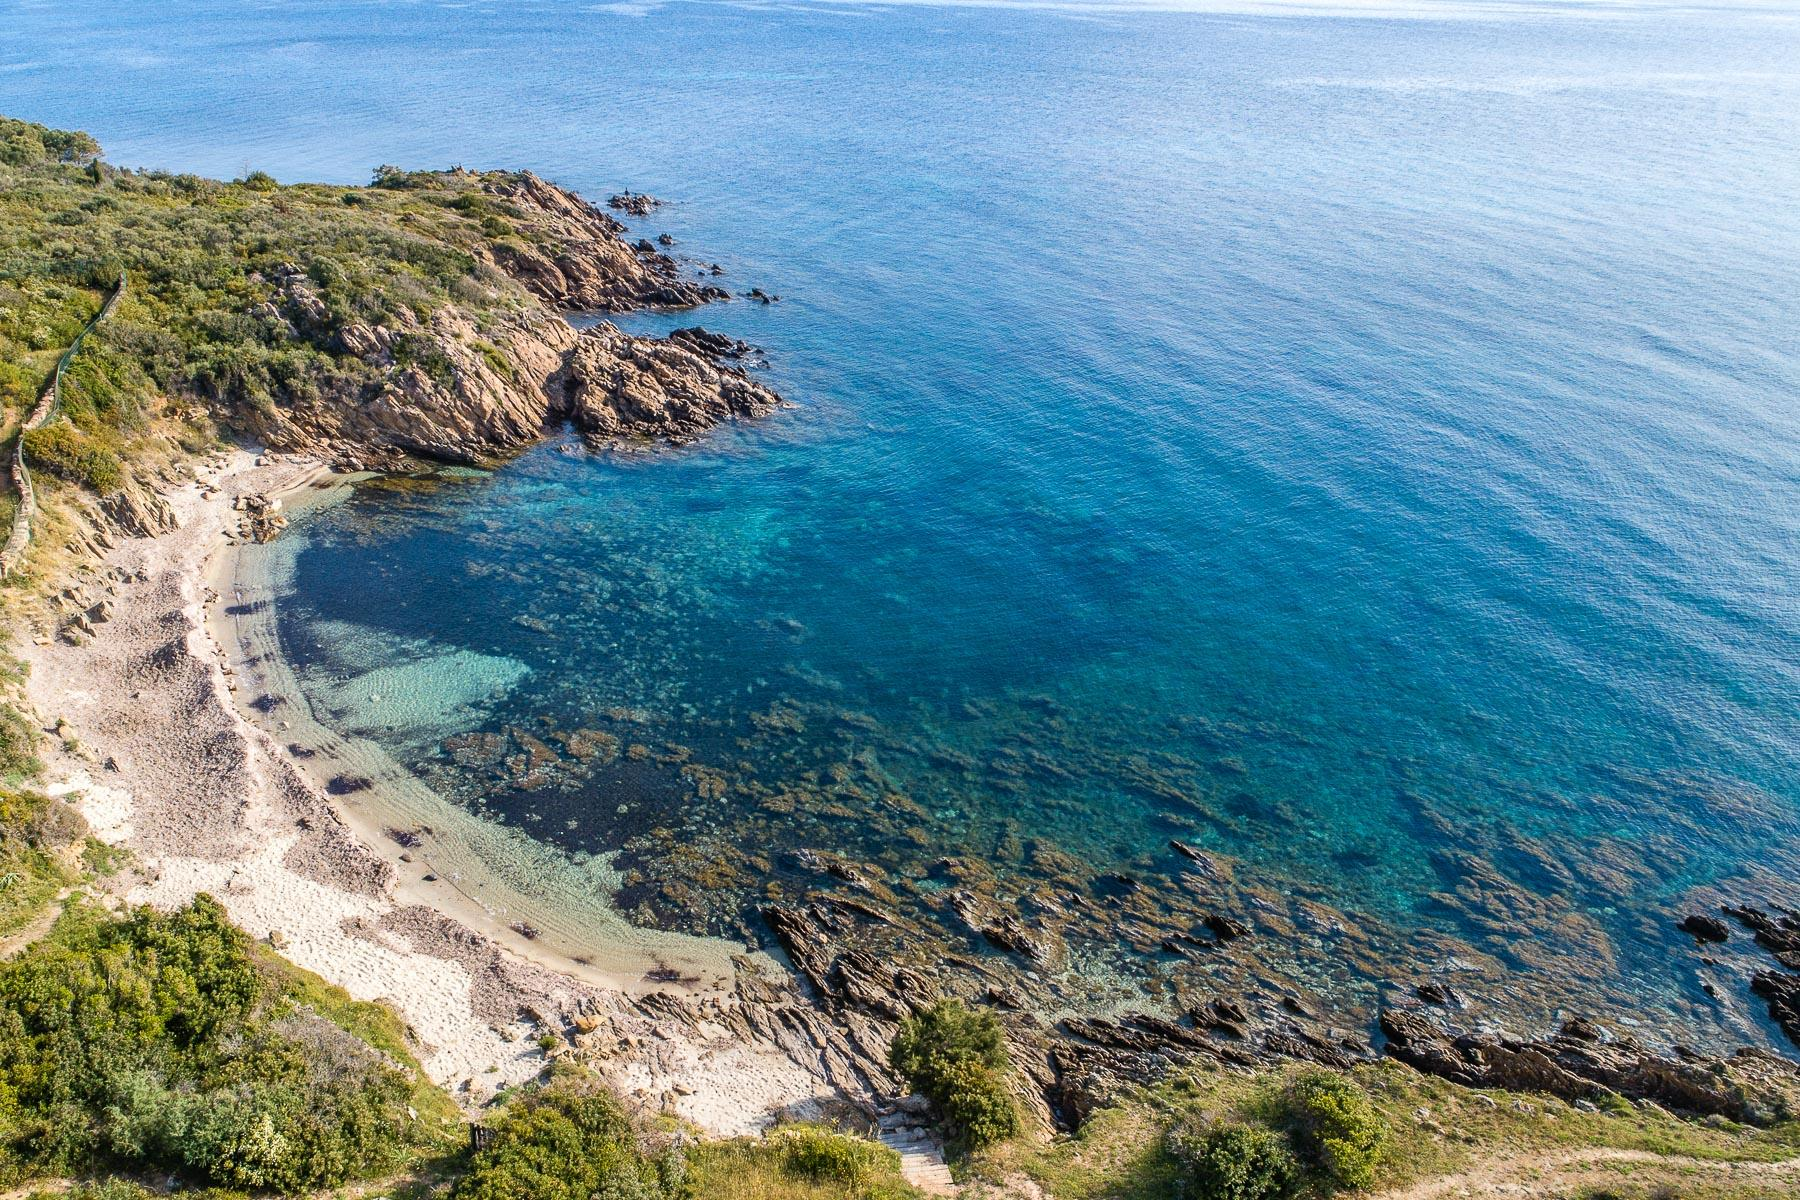 Golfo Aranci Sos Aranzos Wonderfull Villa with direct access to the beach - 2